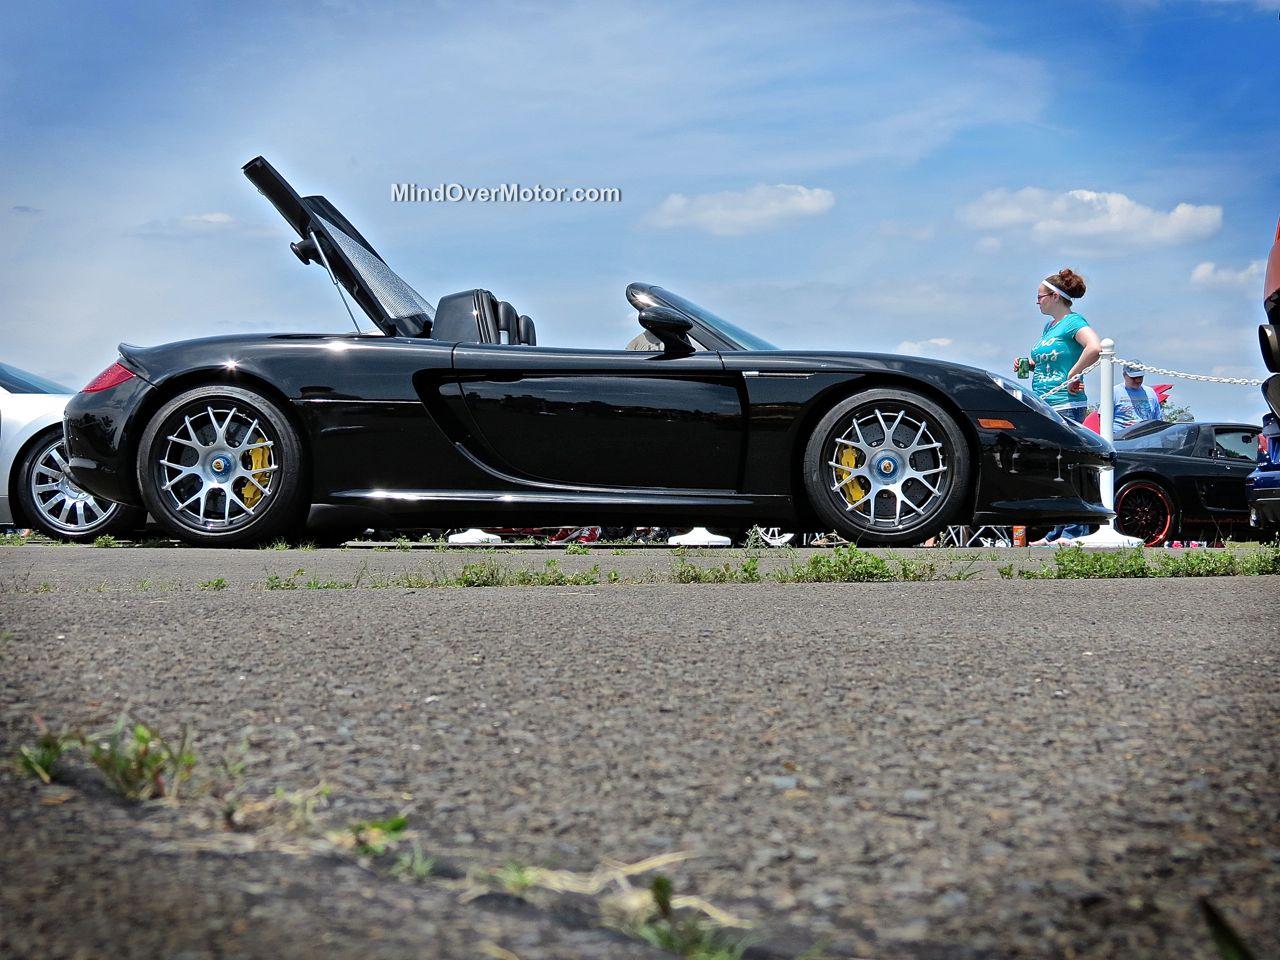 Porsche Carrera GT at CF Charities